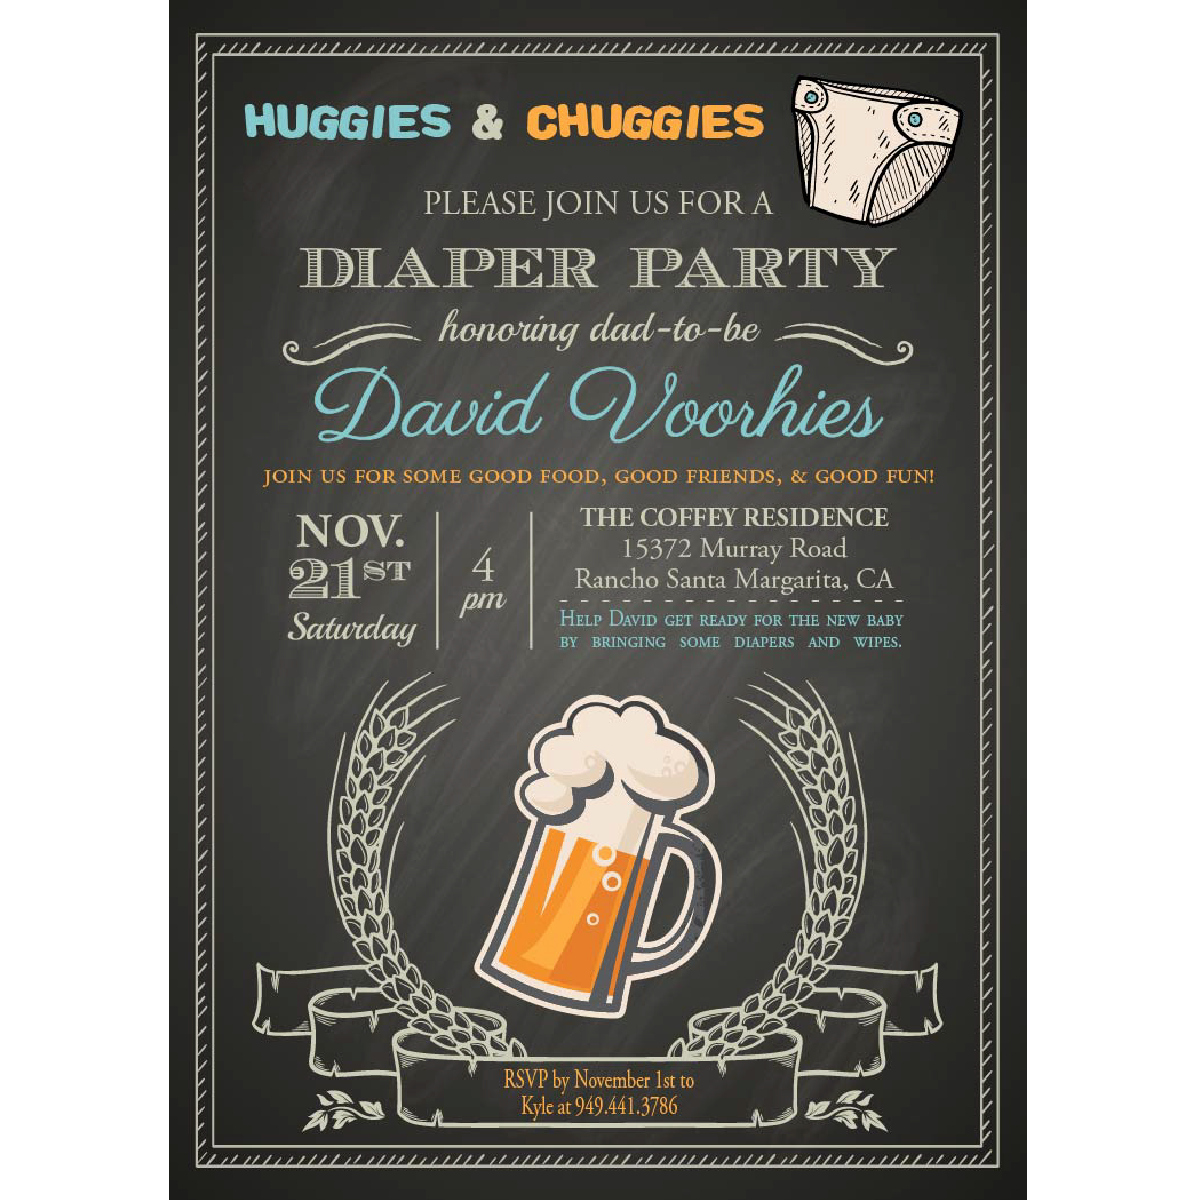 Huggies and Chuggies Invitation Inspirational Huggies & Chuggies Diaper Party Invitations – Blackline